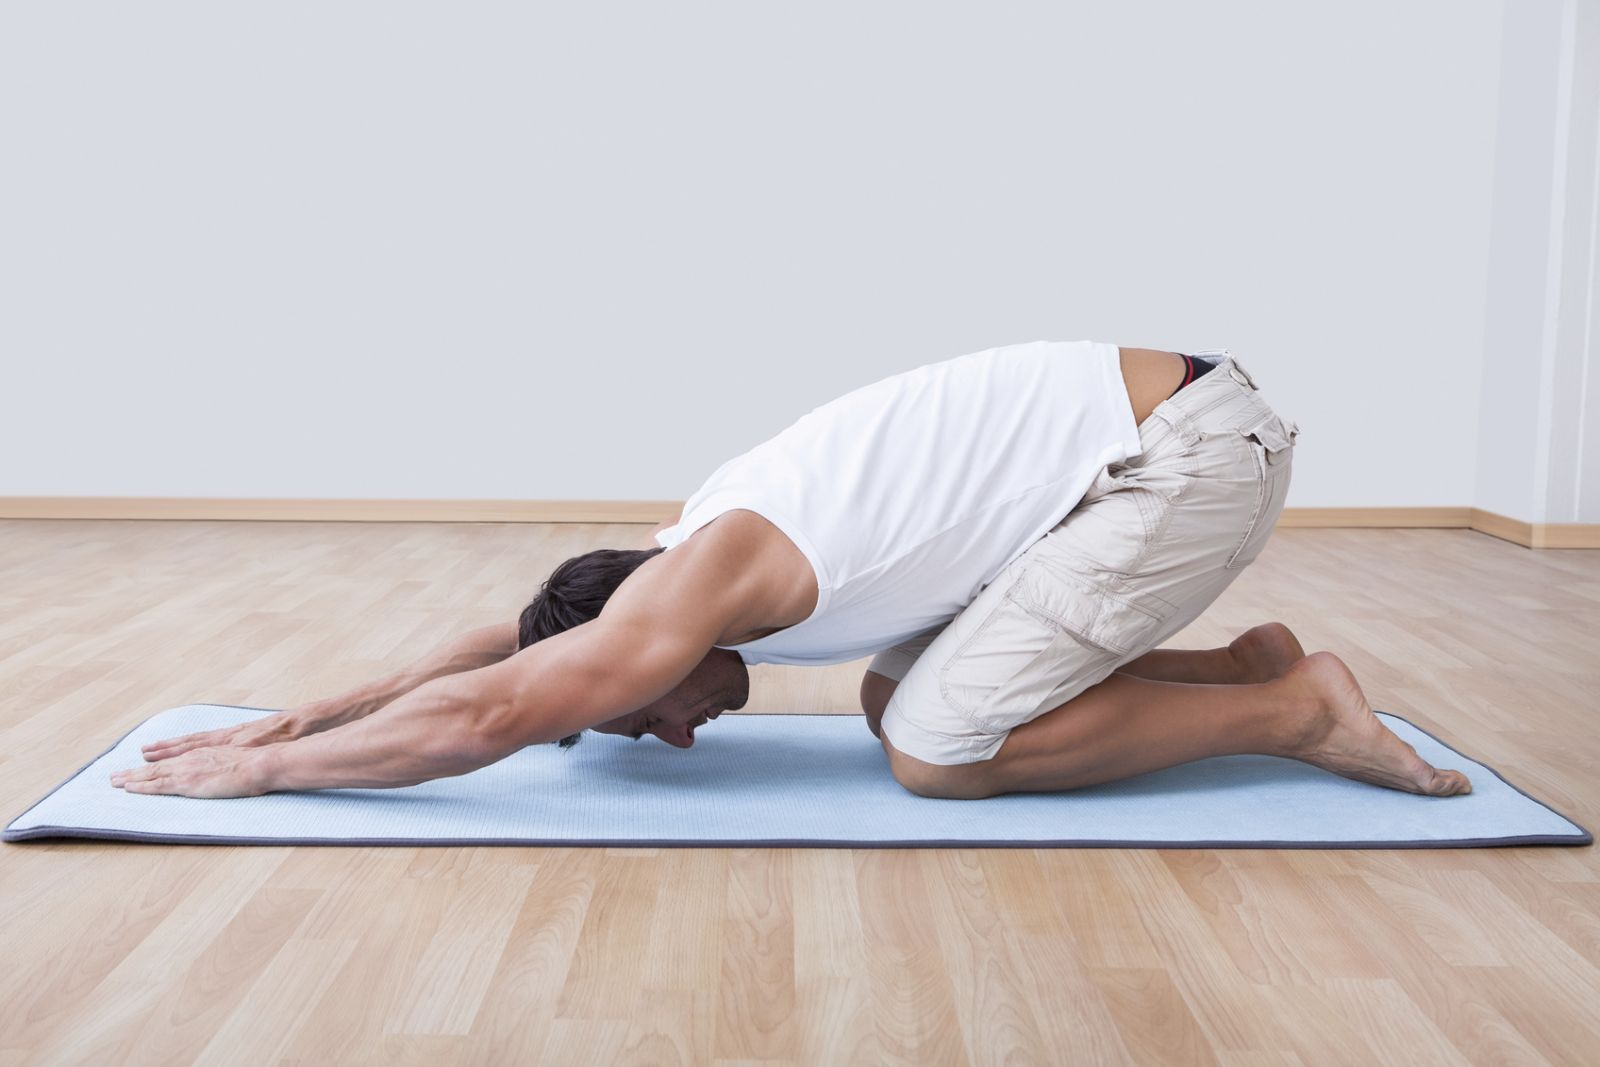 man-doing-yoga-childs-pose-back-stretch-AndreyPopov-iStock_24194848_MEDIUM